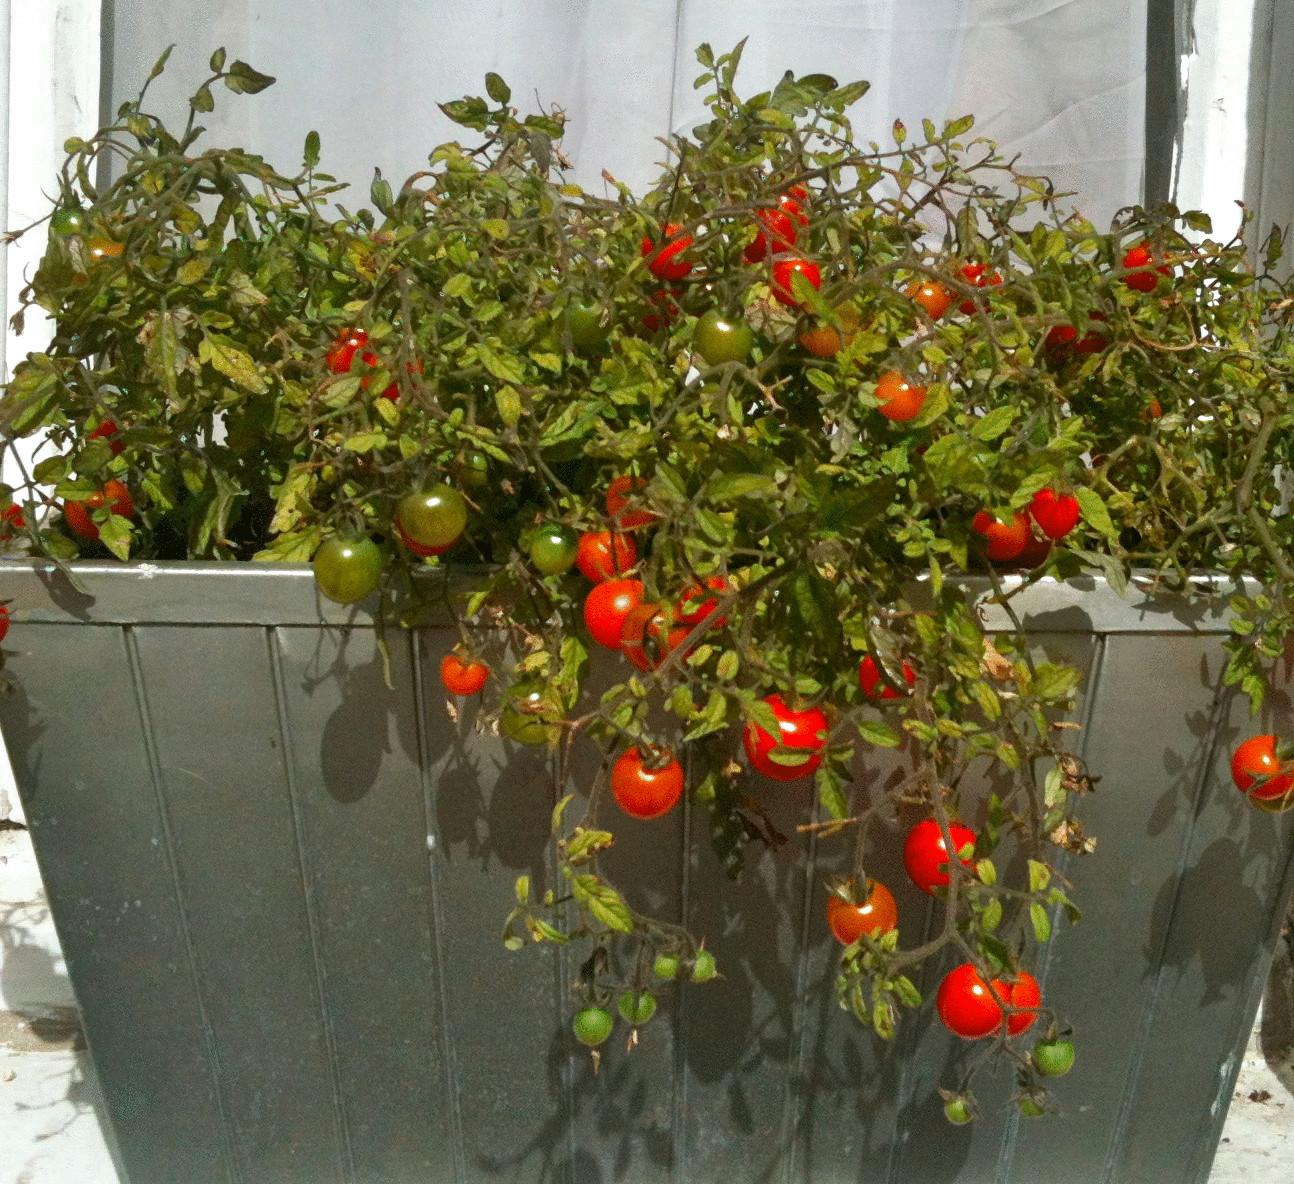 Выращивания помидоров в домашних условиях